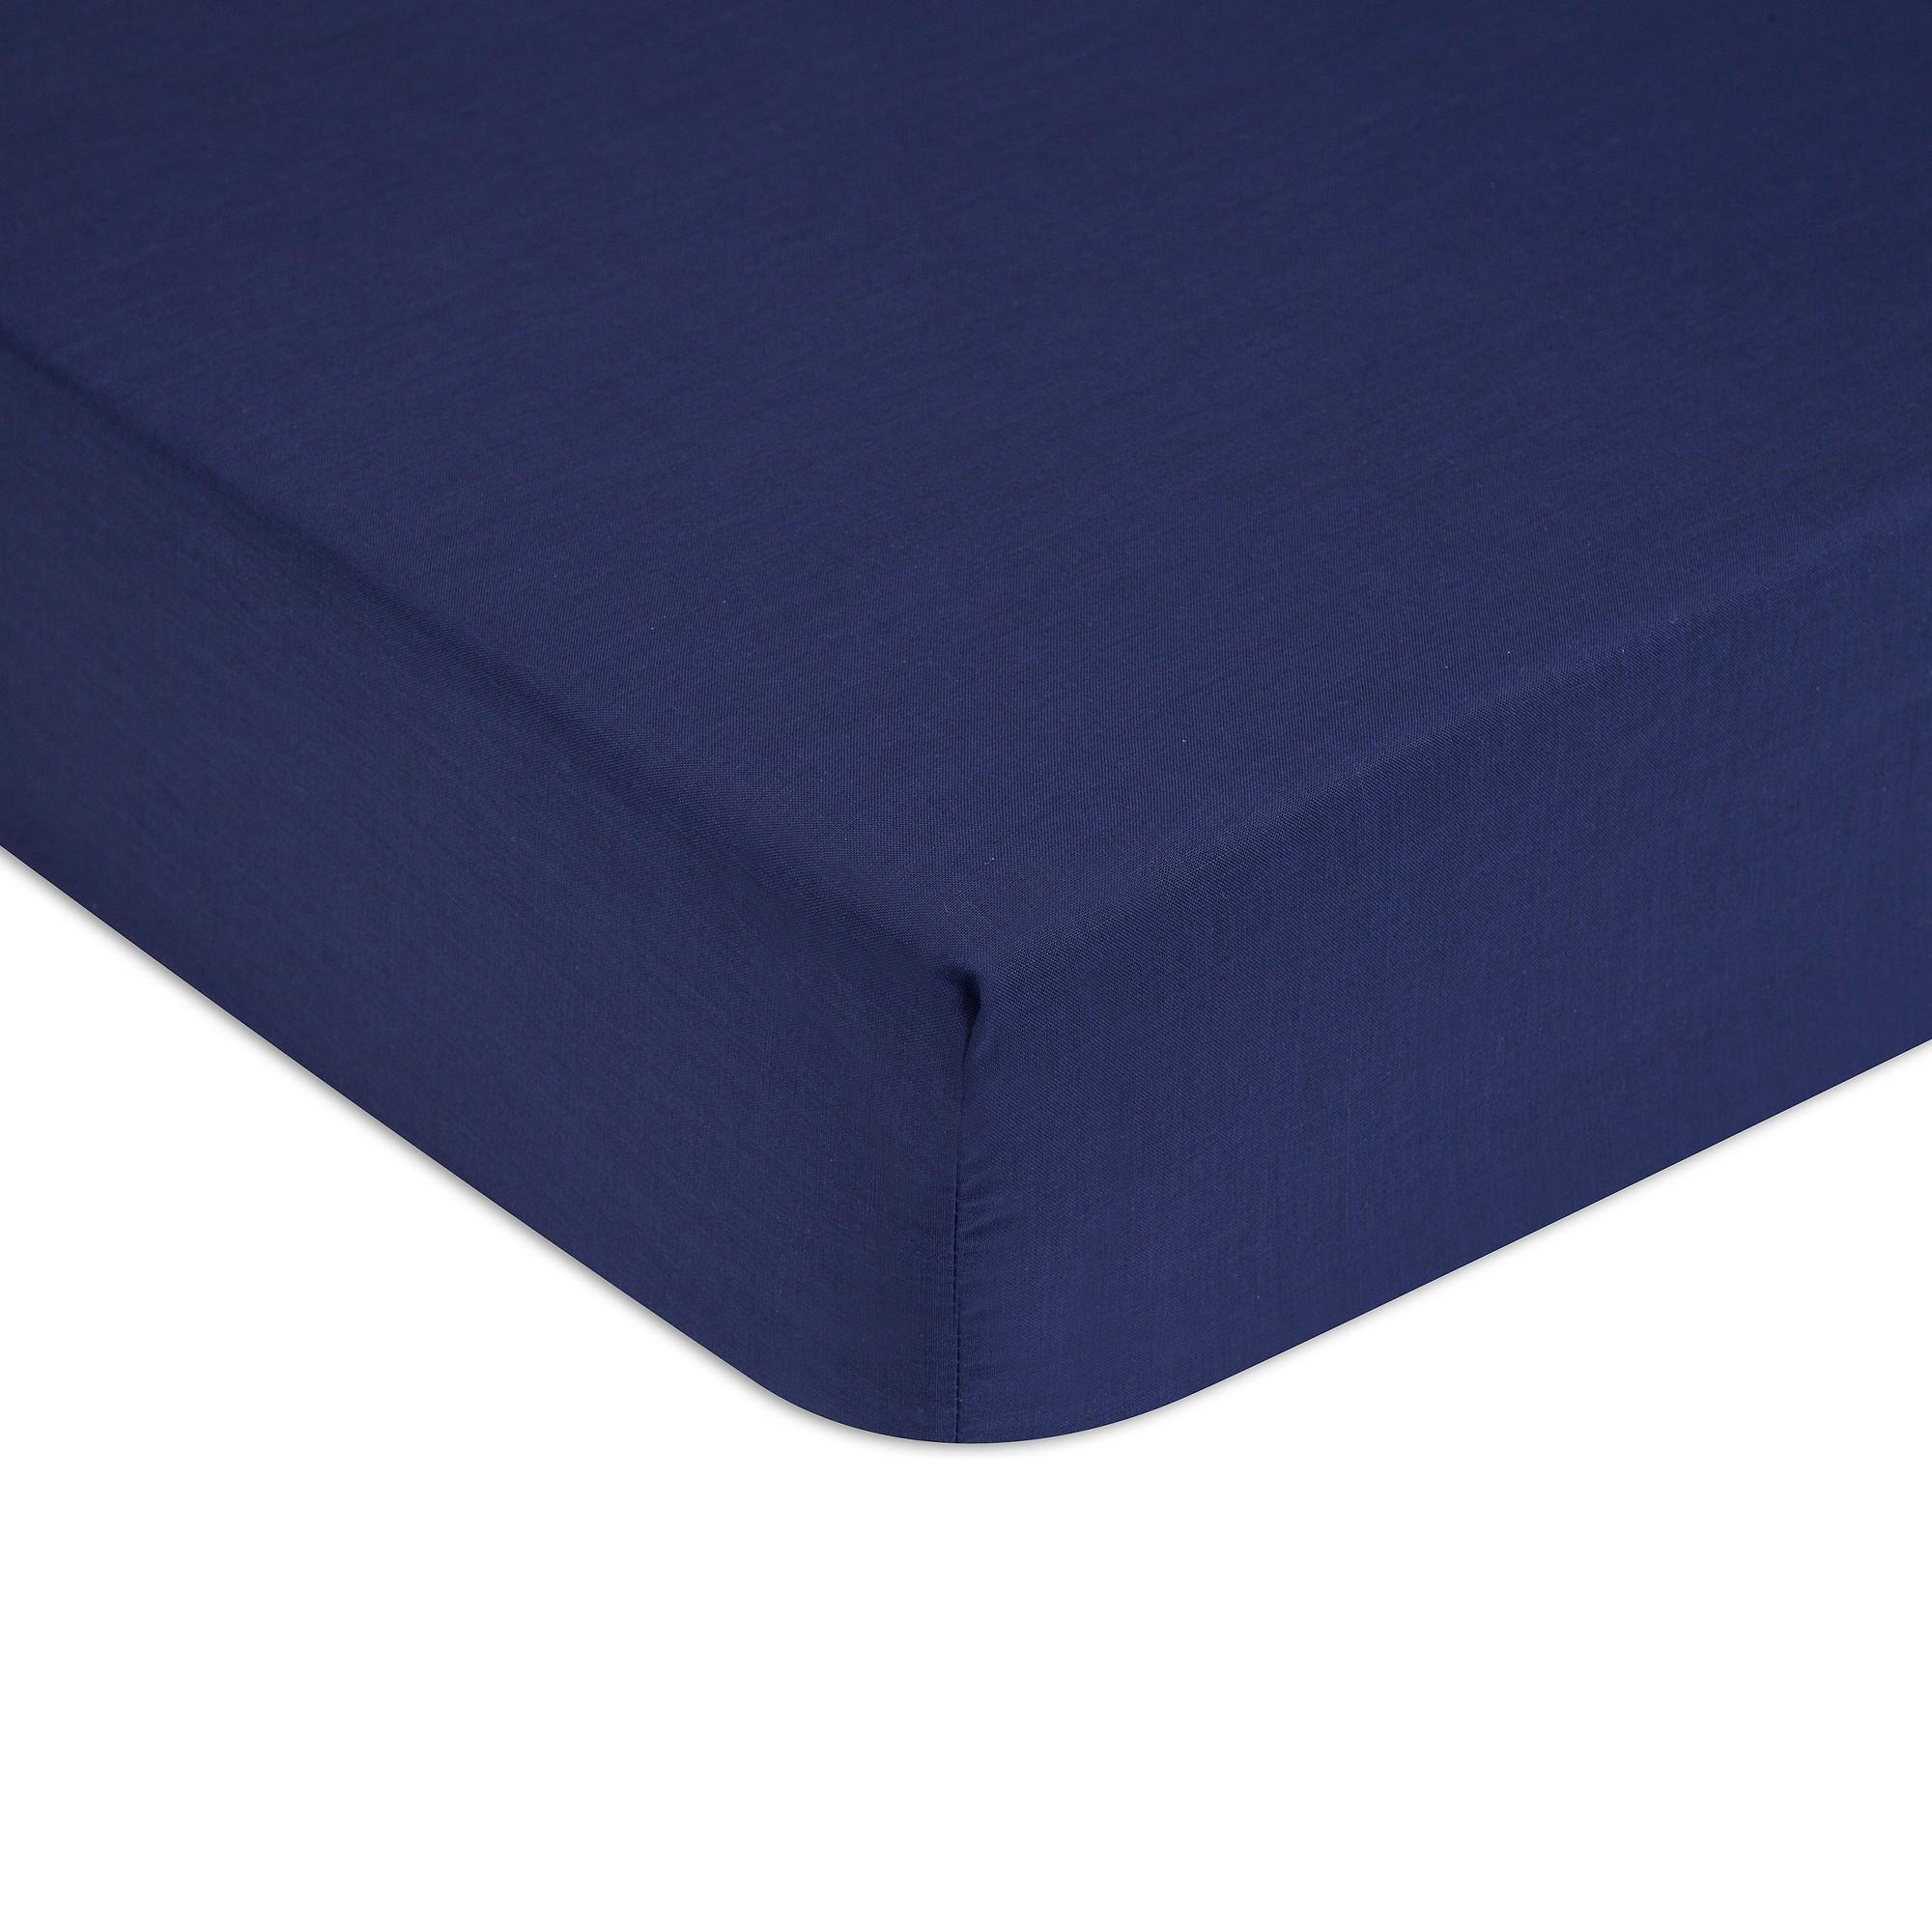 Cearceaf de pat cu elastic Tommy Hilfiger Unis Percale 180x200cm Albastru Navy